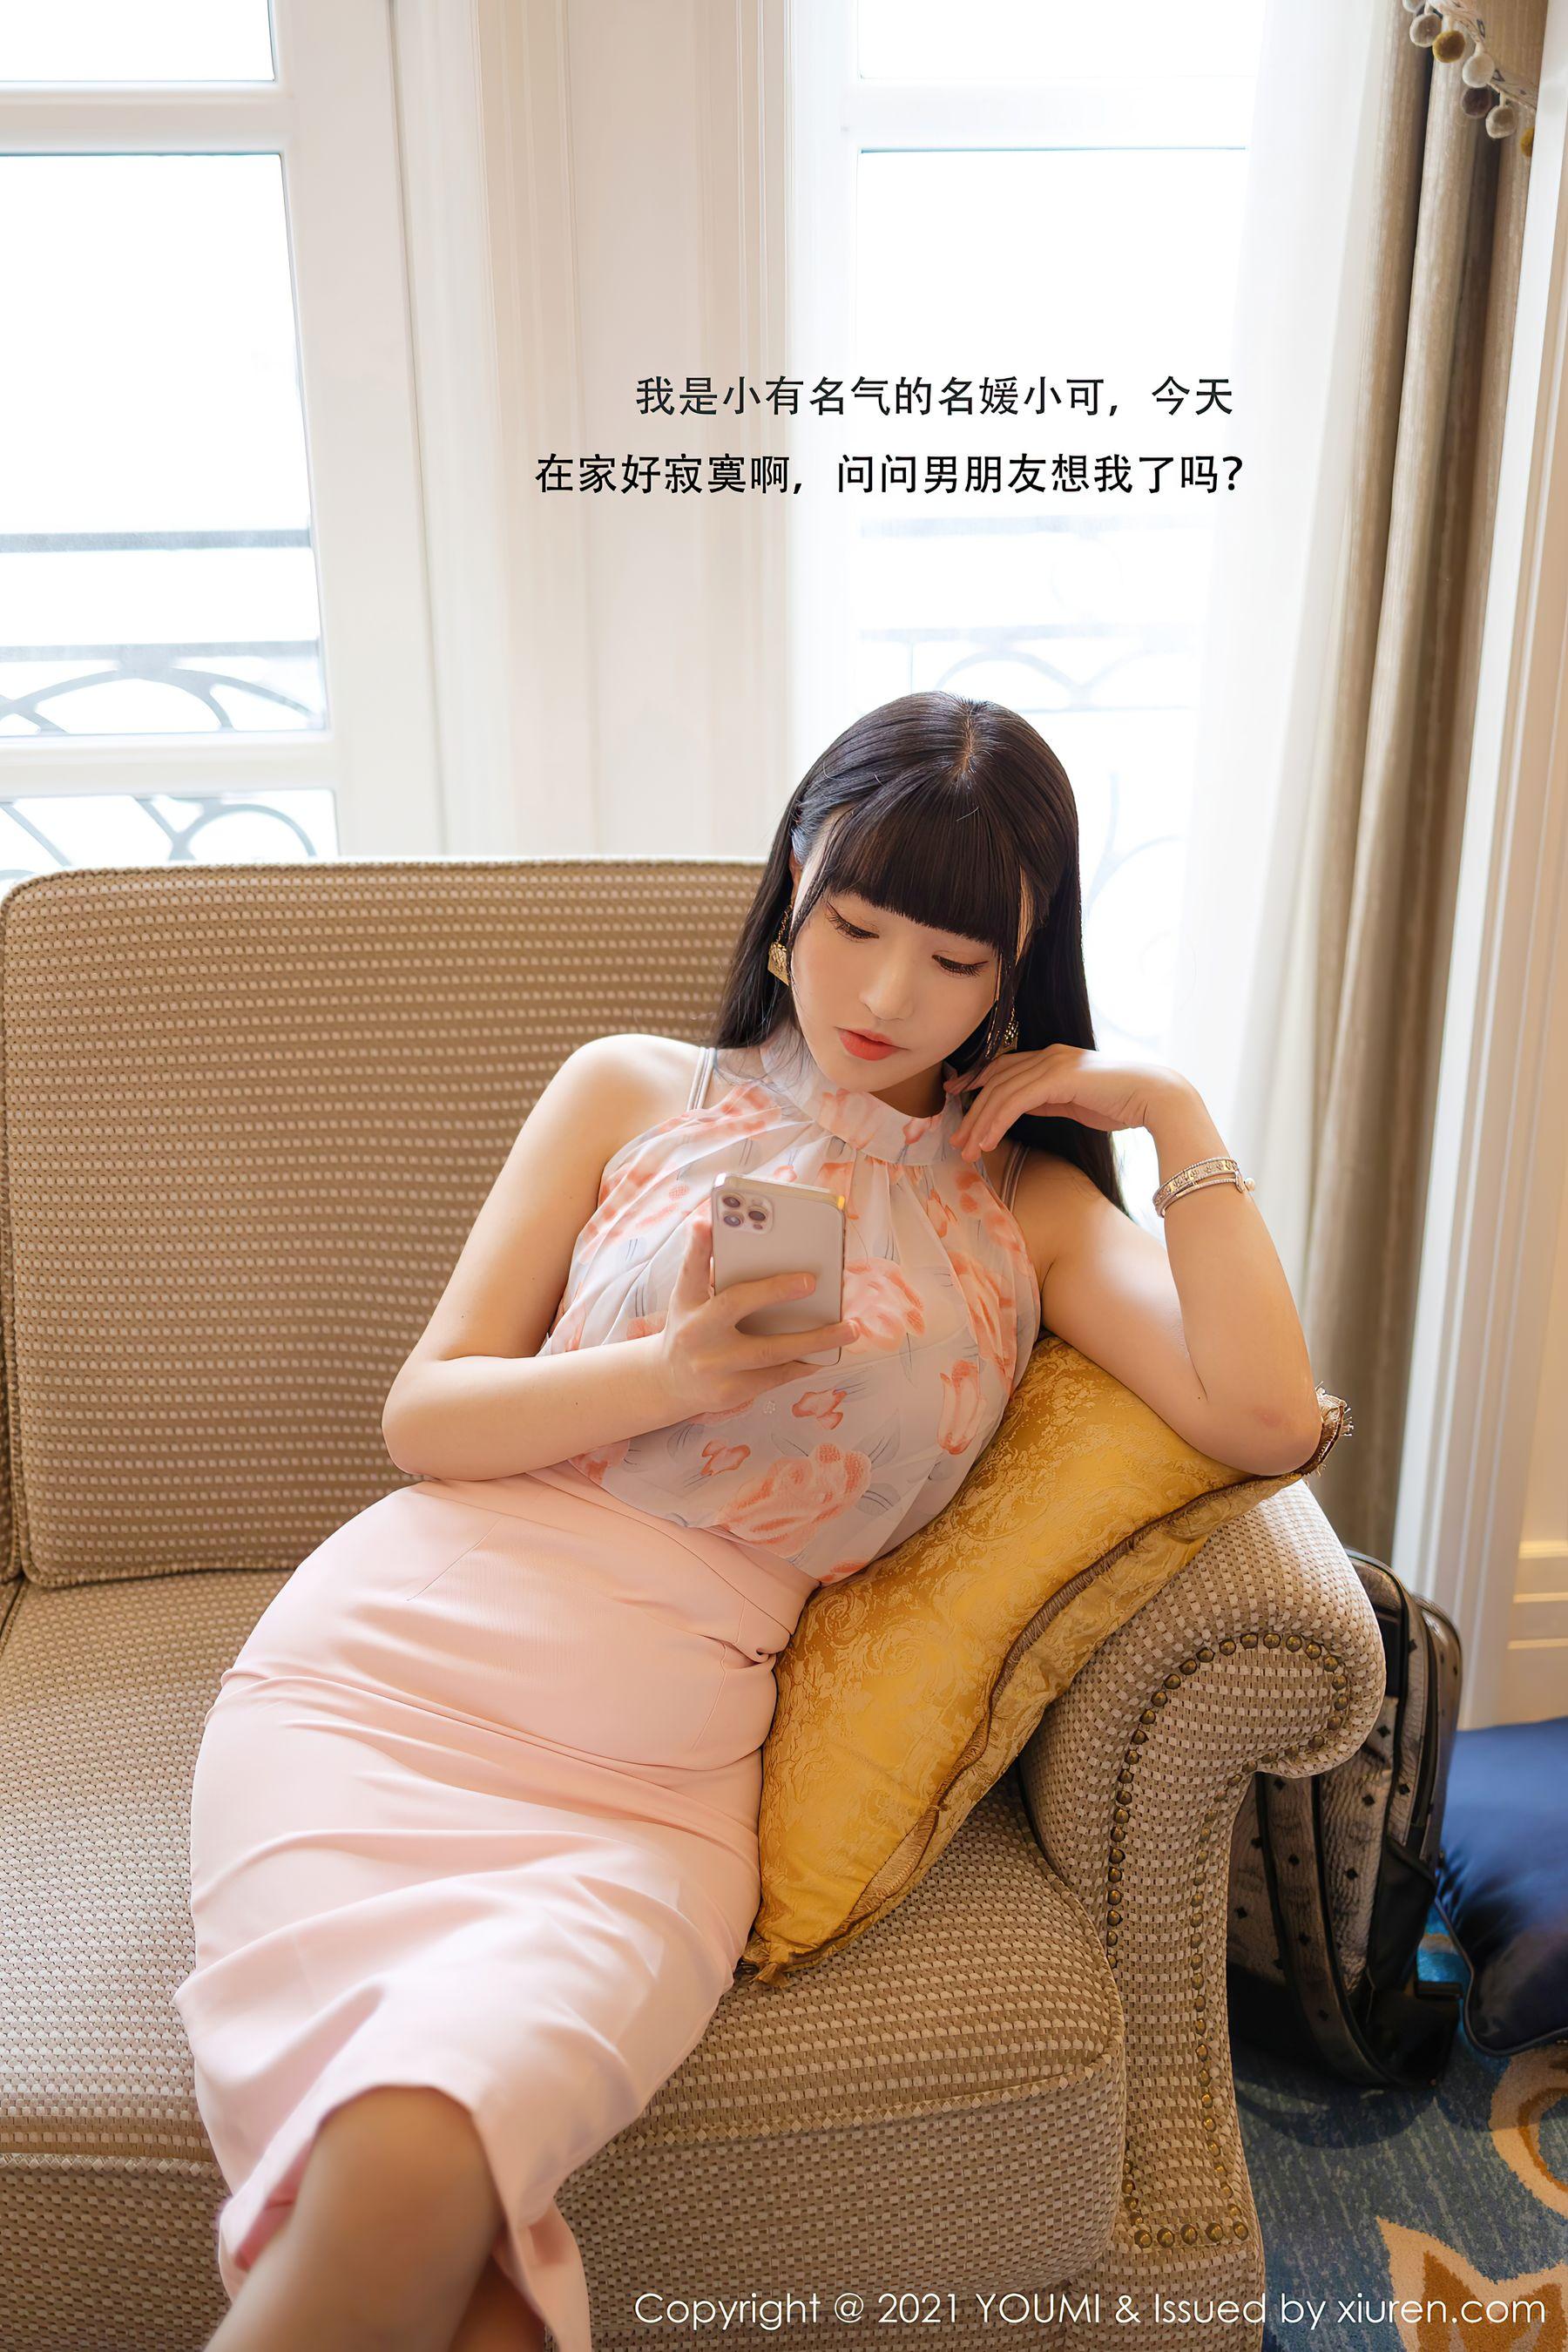 VOL.1727 [尤蜜荟]女友美女故事:朱可儿(Barbie可儿,Flower朱可儿)超高清写真套图(158P)